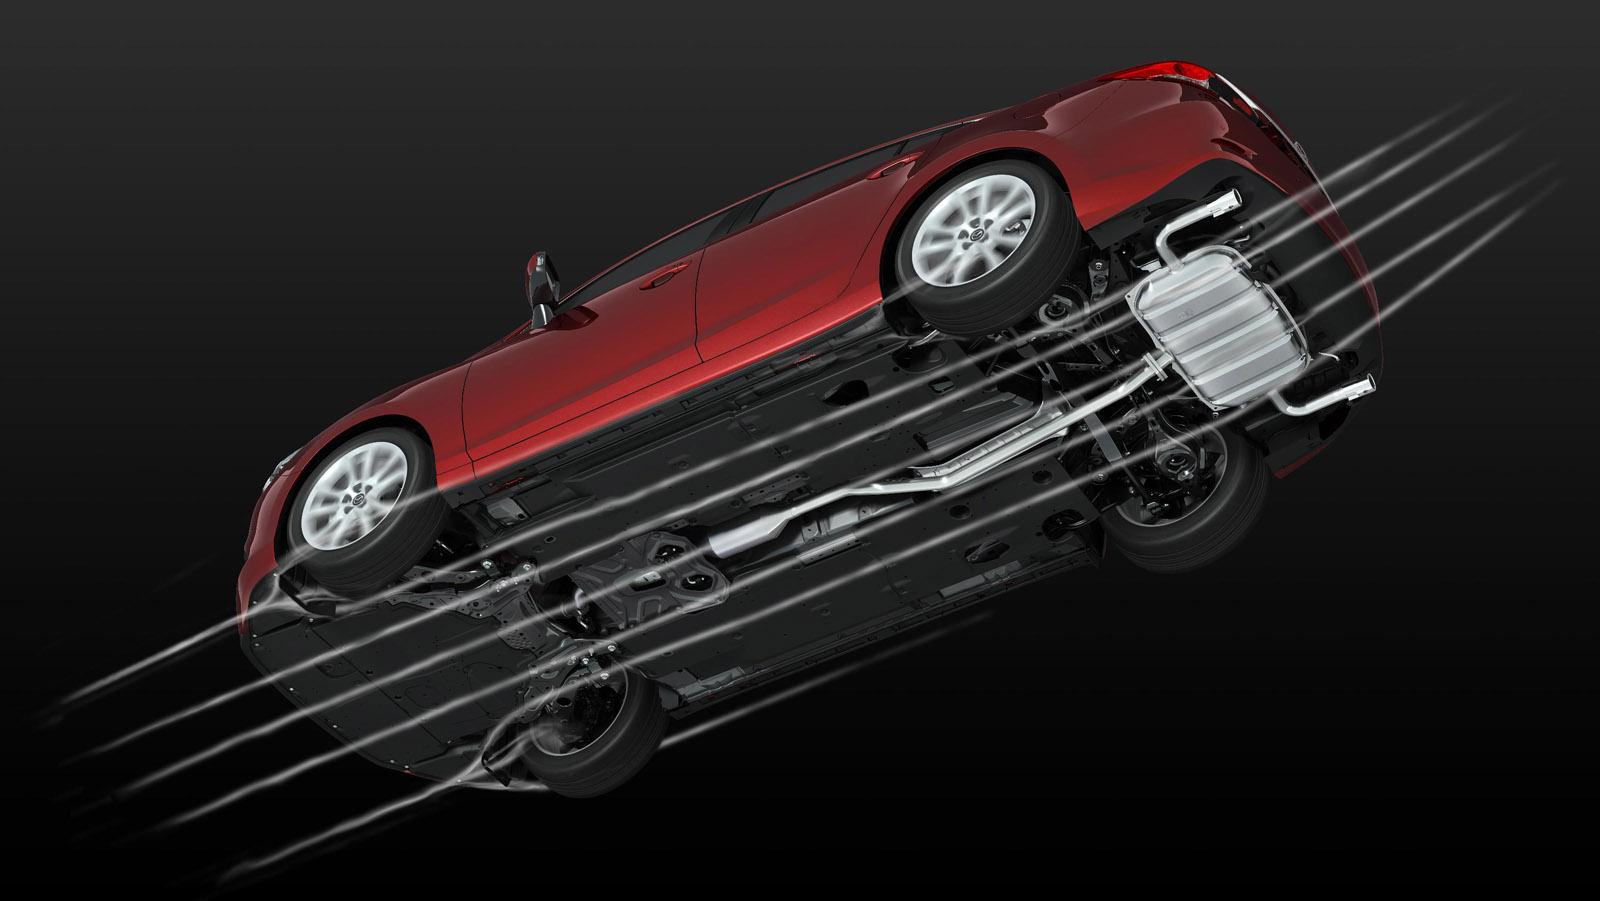 1908_588701_Mazda6_2012_technical_10_Aerodynamics